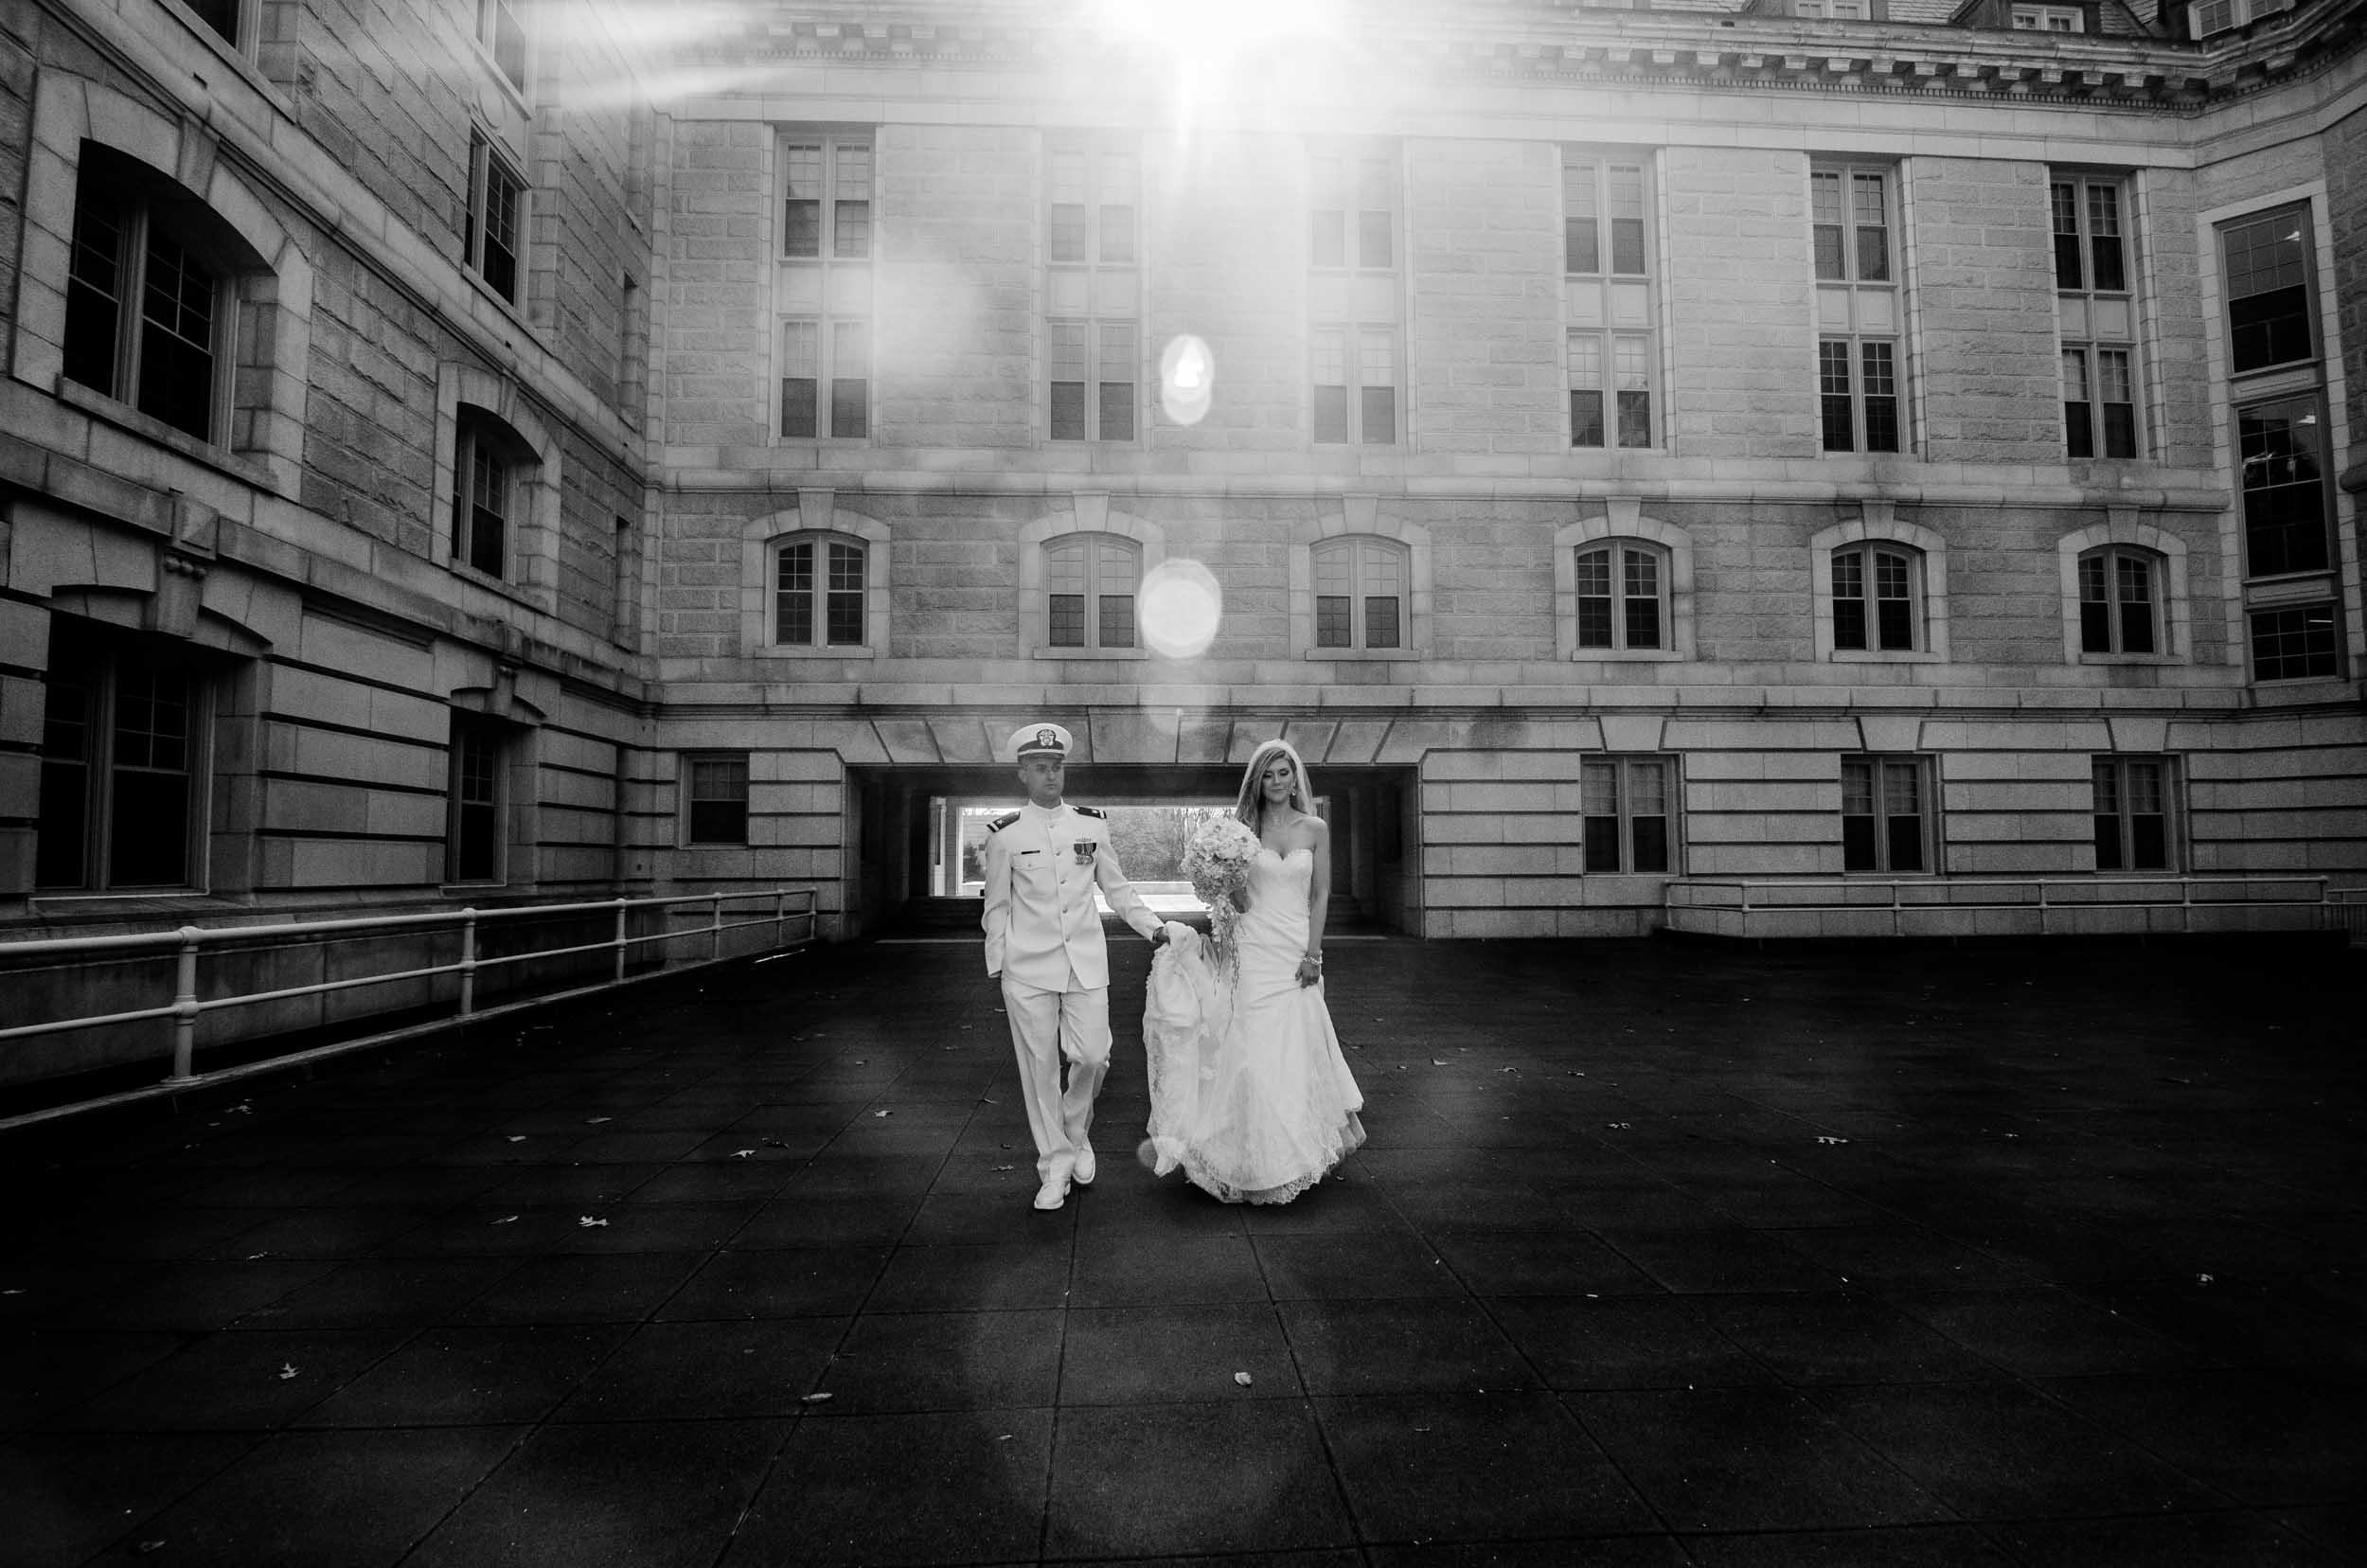 dc+metro+wedding+photographer+vadym+guliuk+photography+wedding+bride+and+groom-2022.jpg